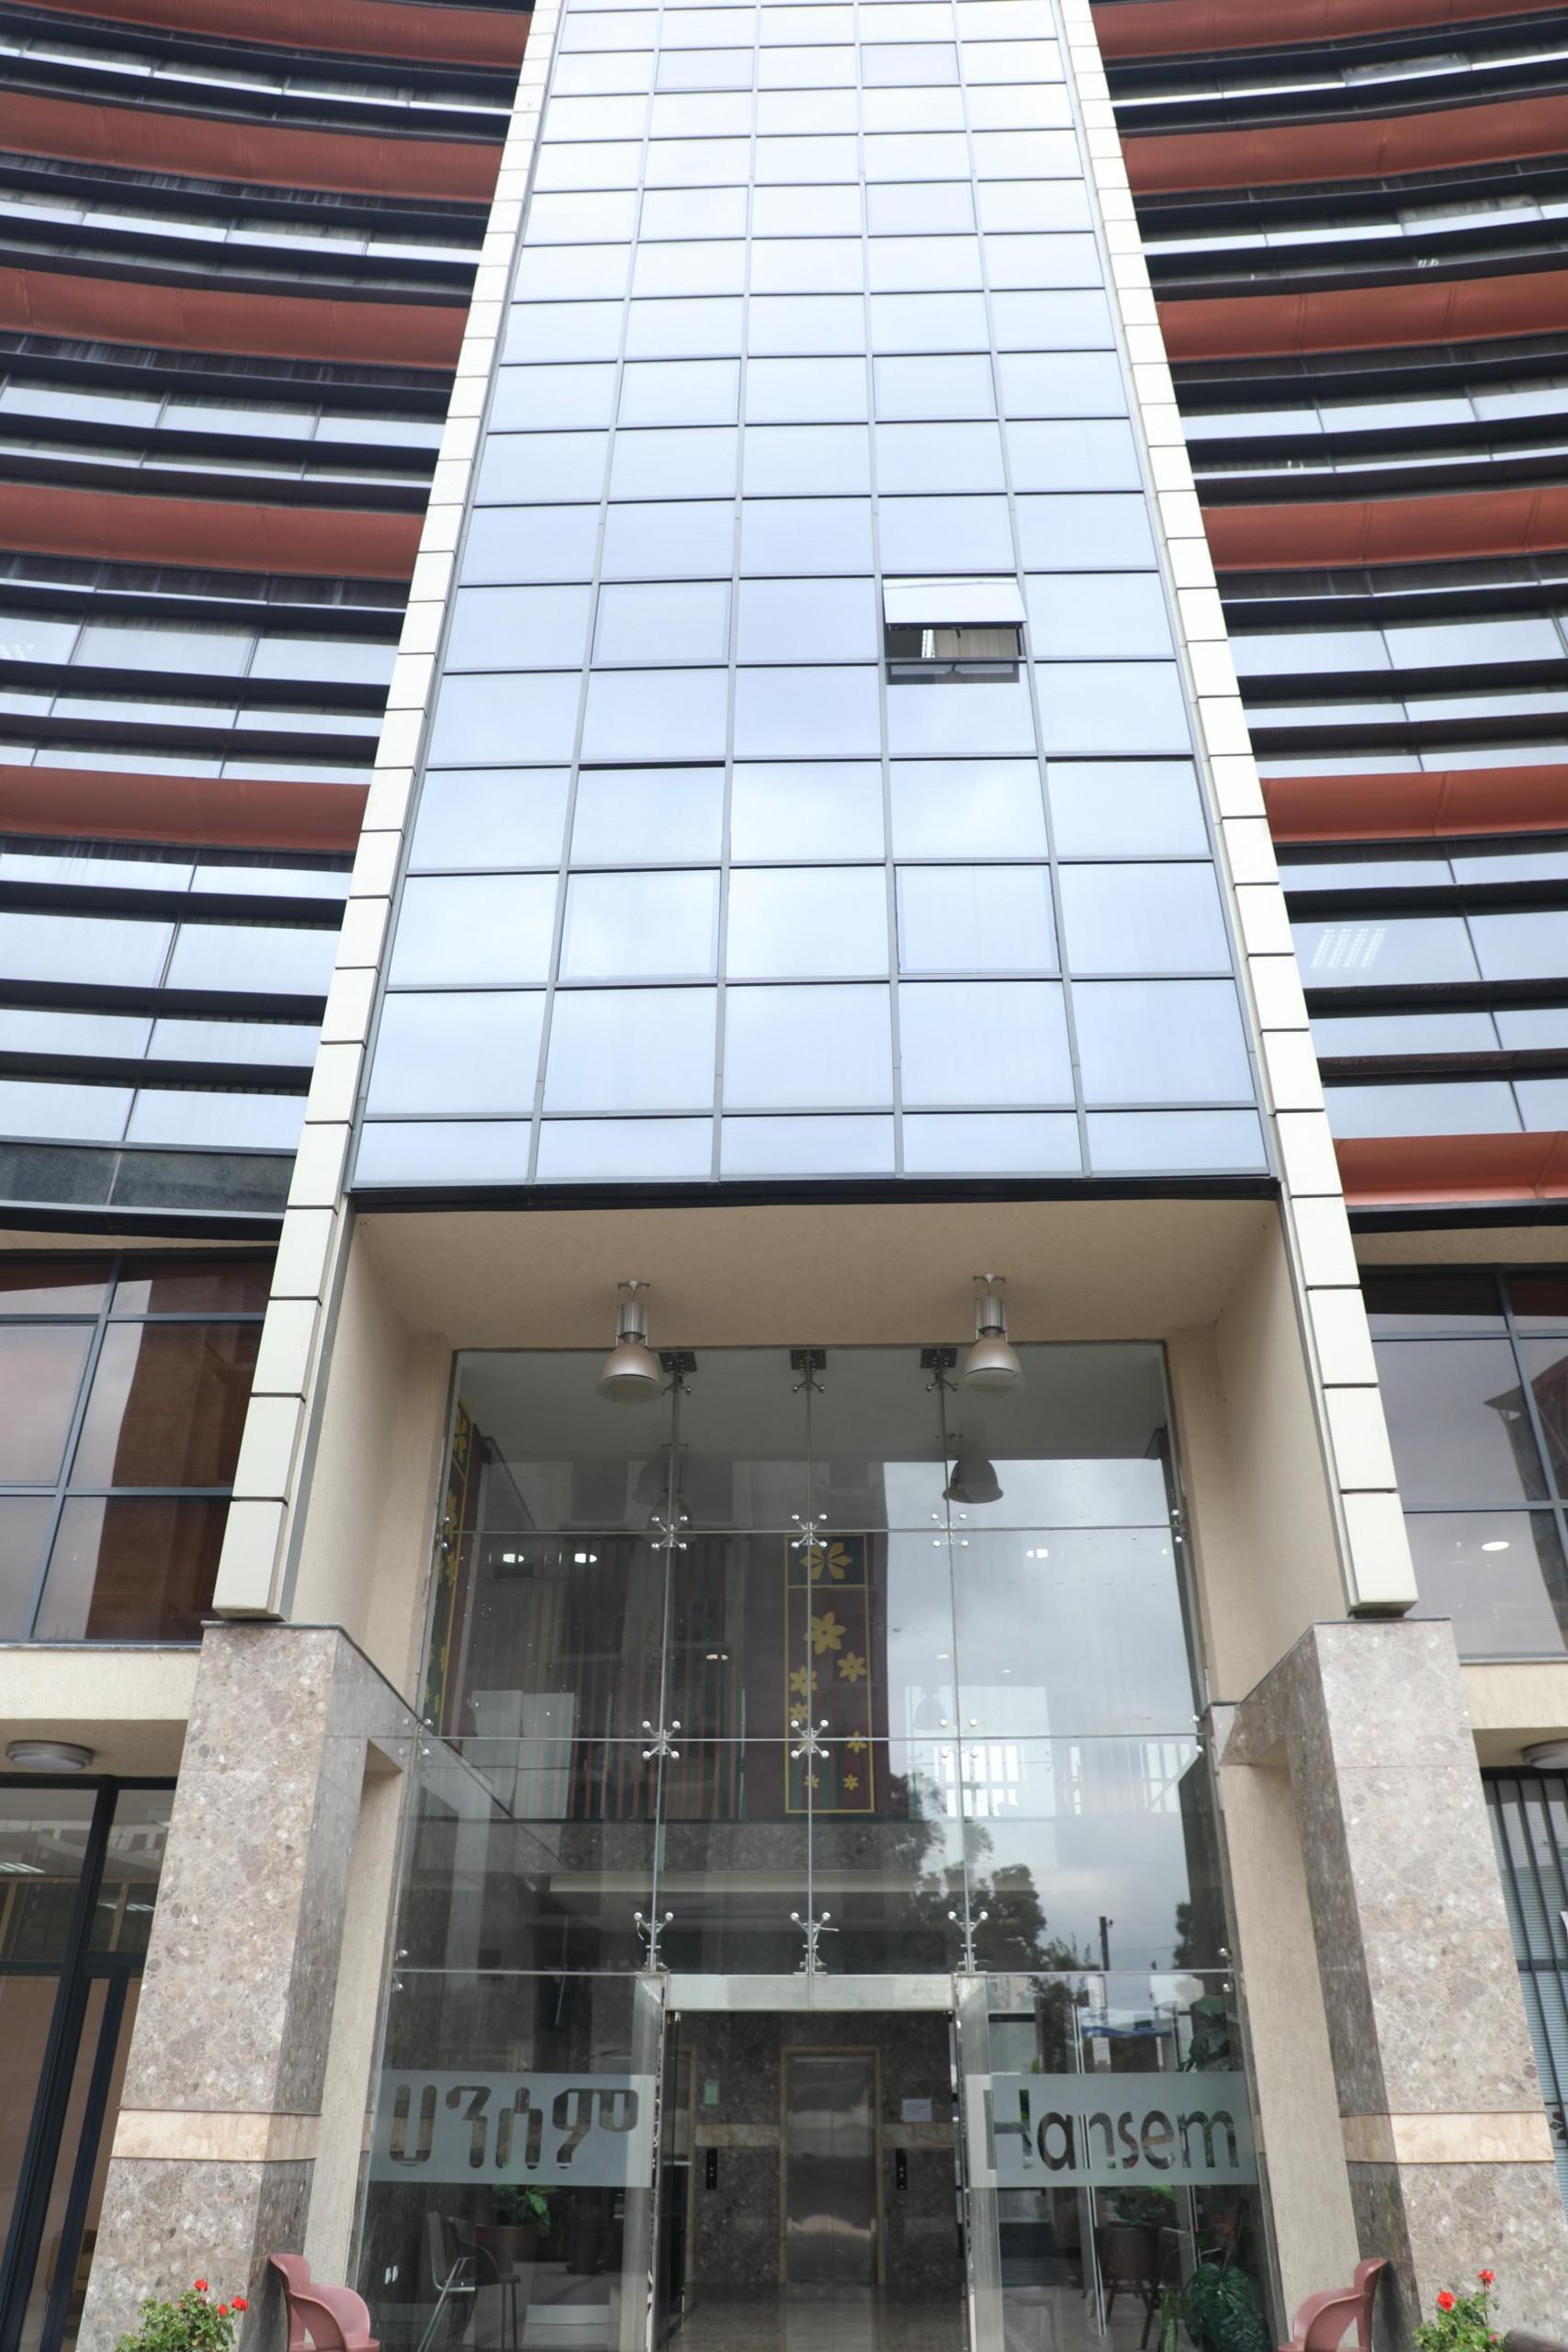 1J2A8577 scaled - Hansem Office Park